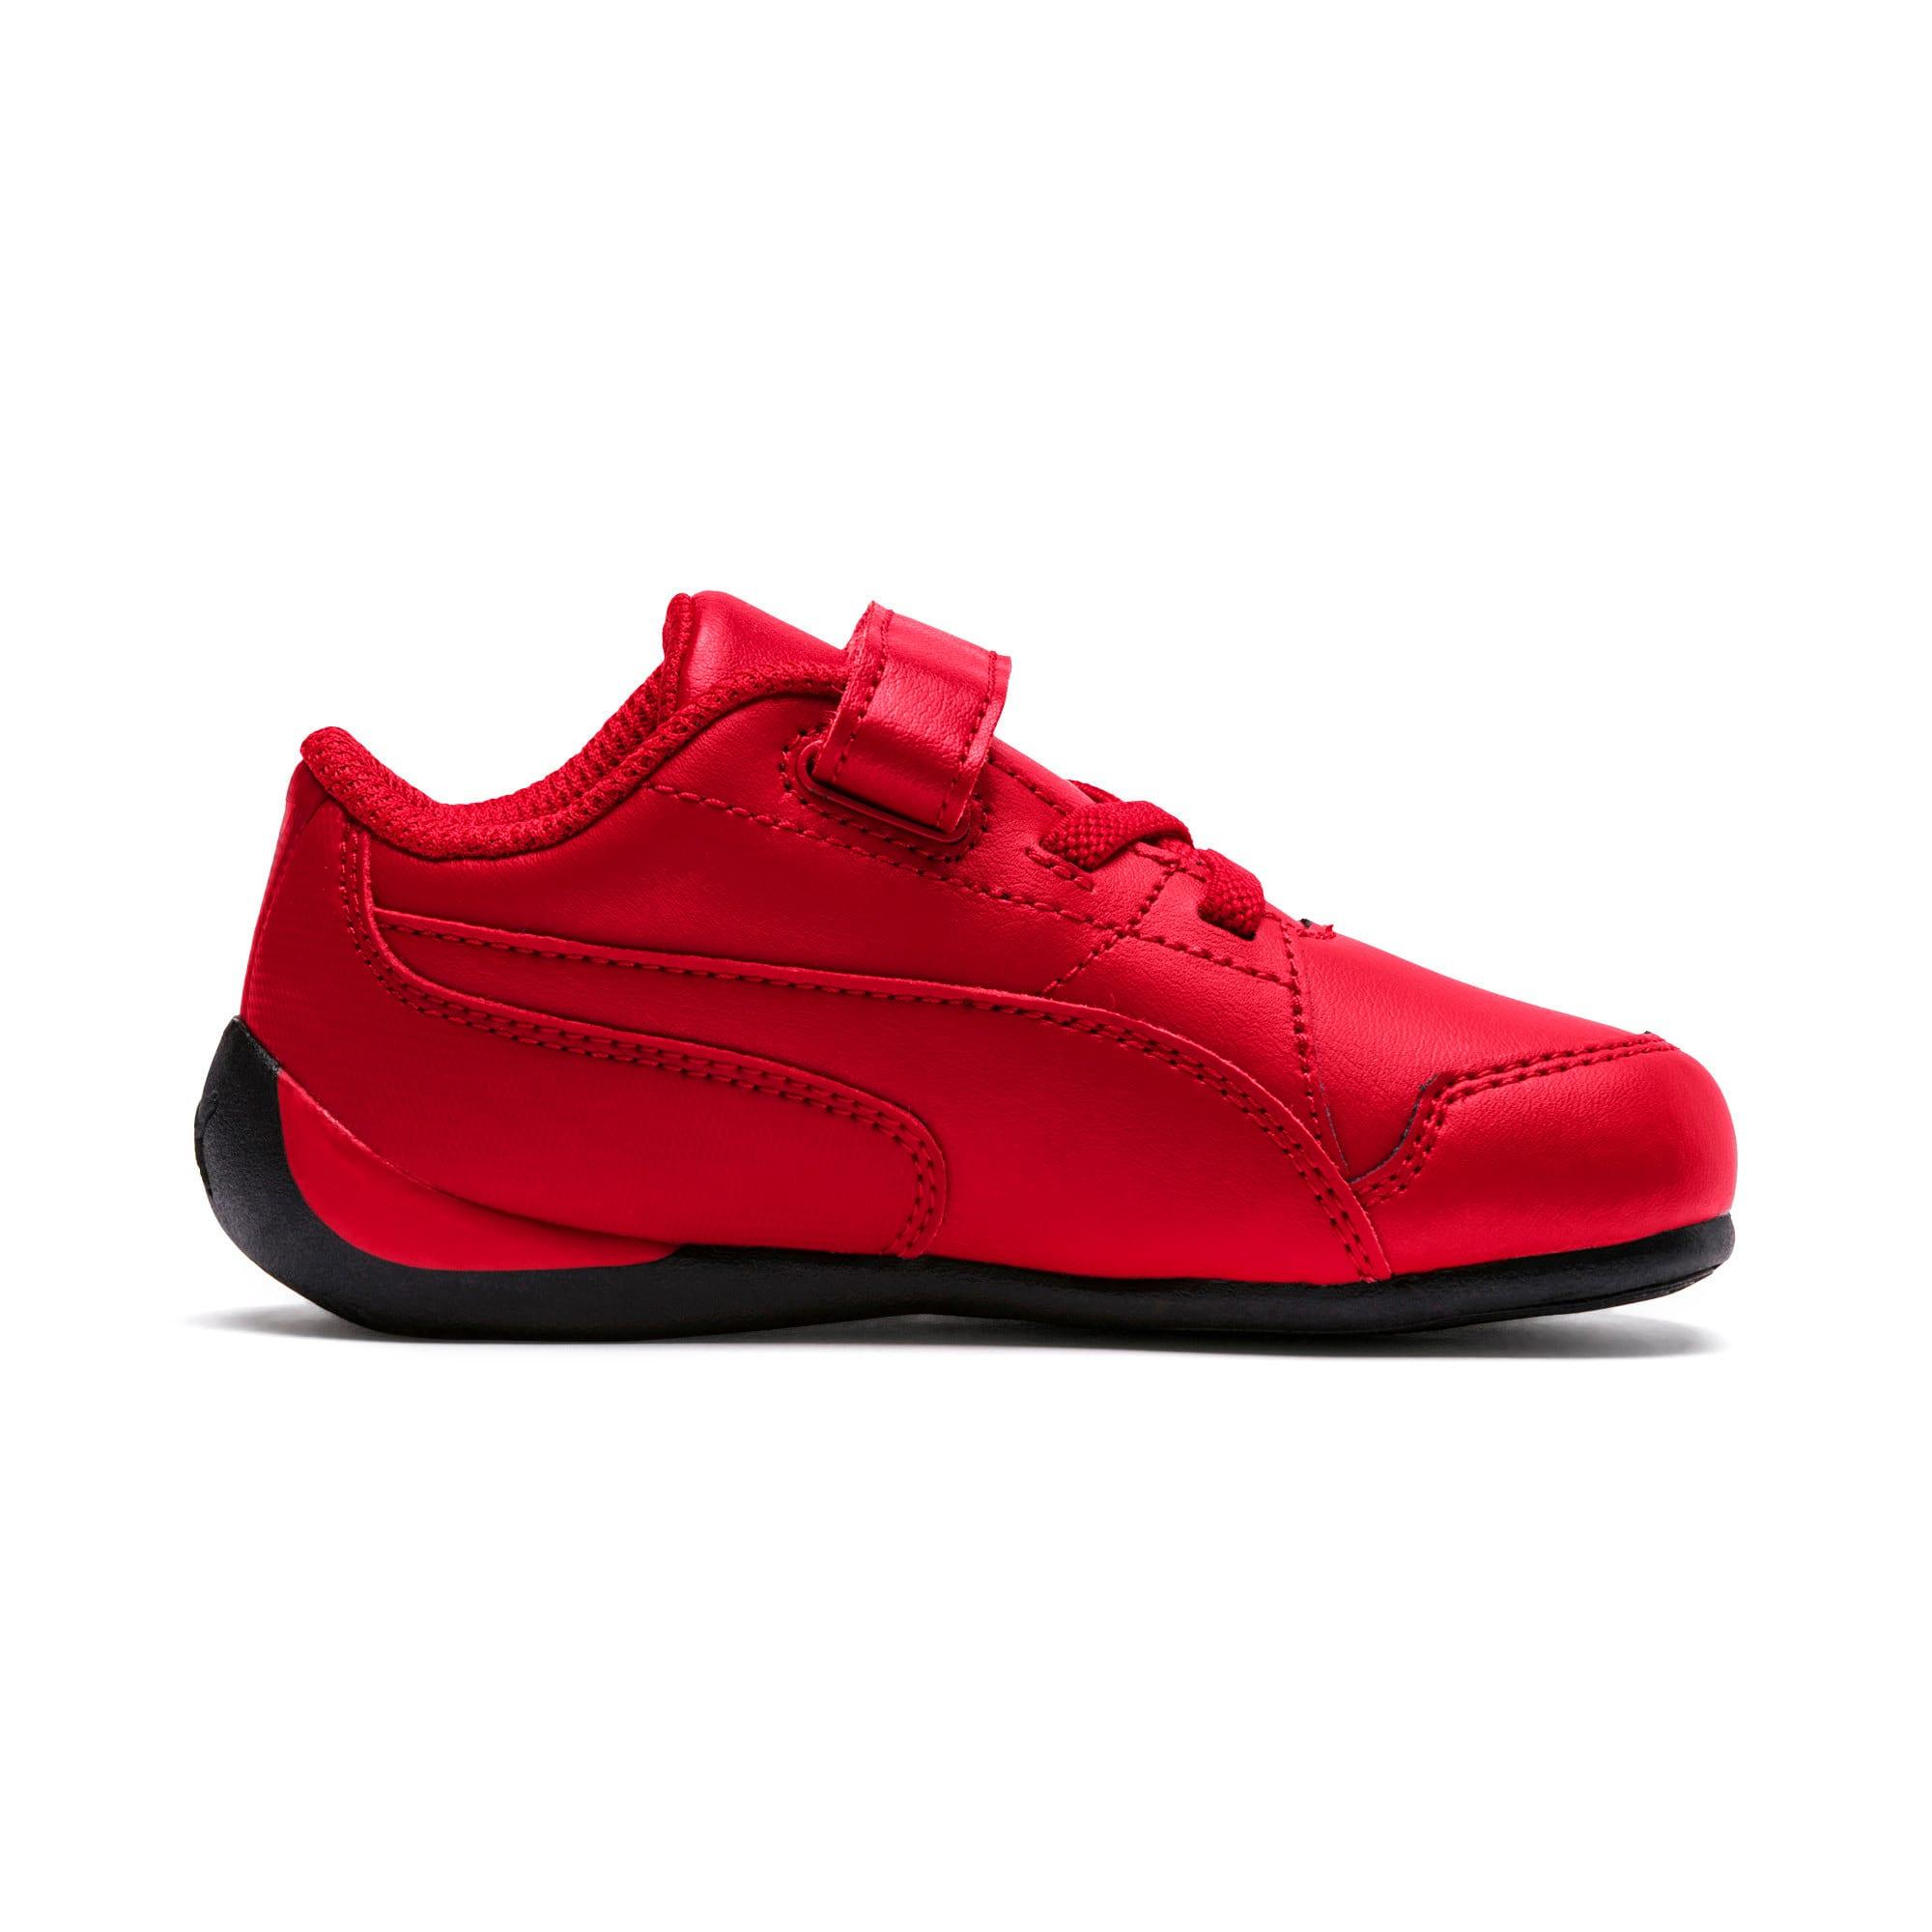 Thumbnail 5 of Ferrari Drift Cat 7 V Kinder Sneaker, Rosso Corsa-Rosso Corsa, medium